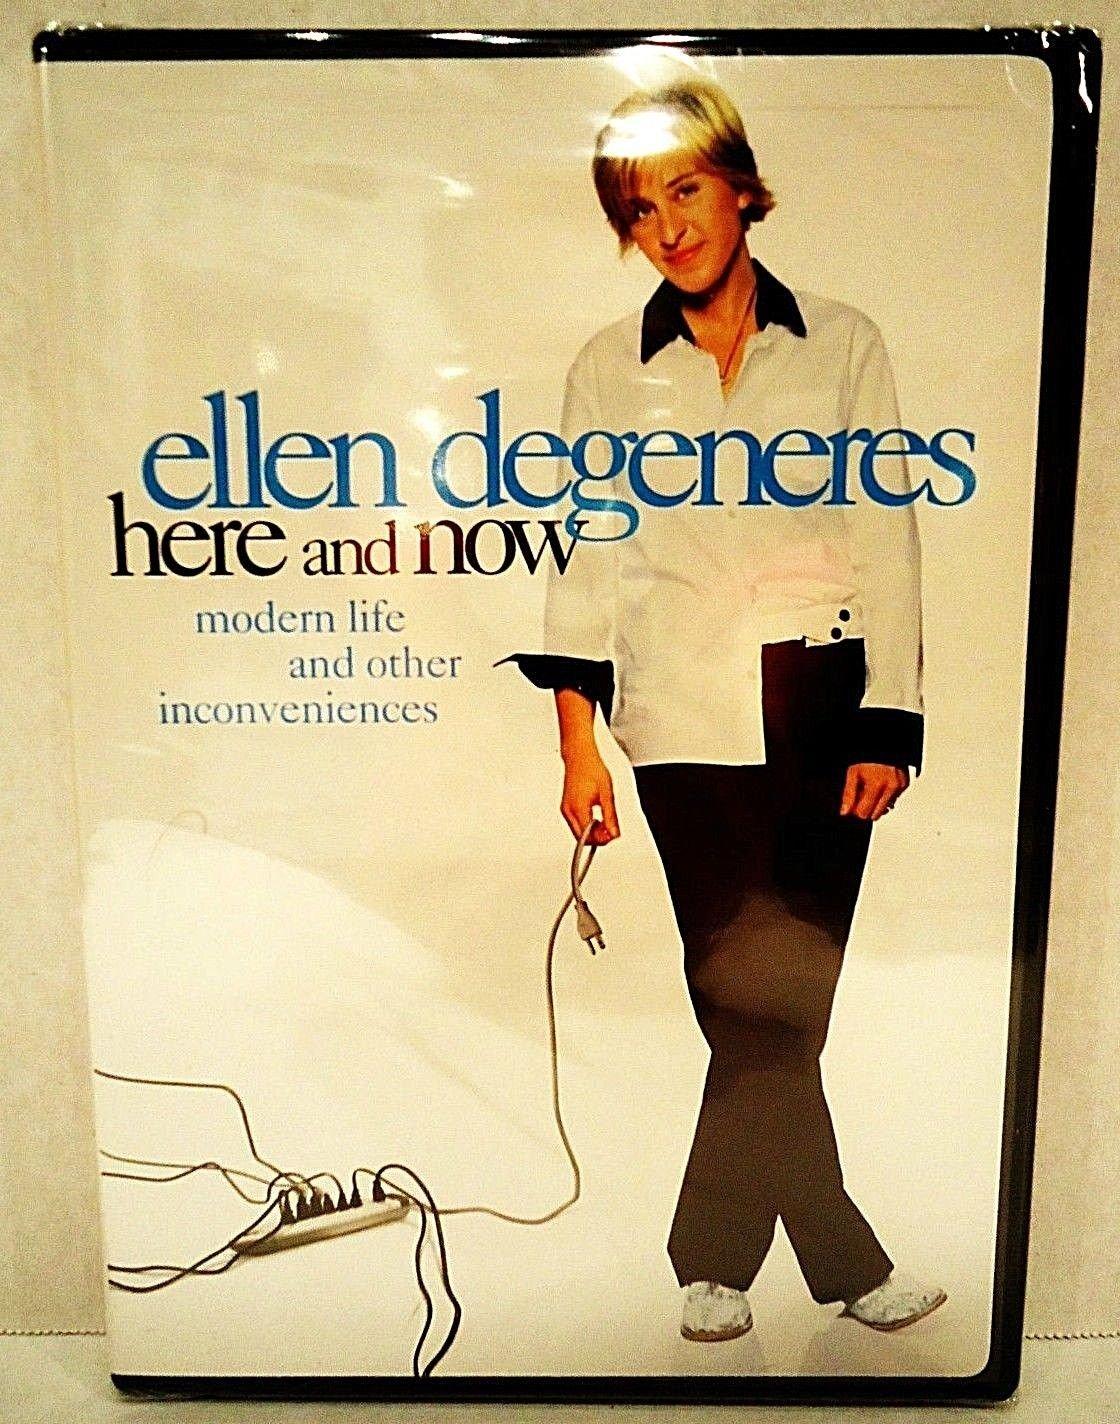 ELLEN DeGENERES - HERE AND NOW - DVD - HBO - FILMS - BRAND NEW - COMEDY - MOVIE